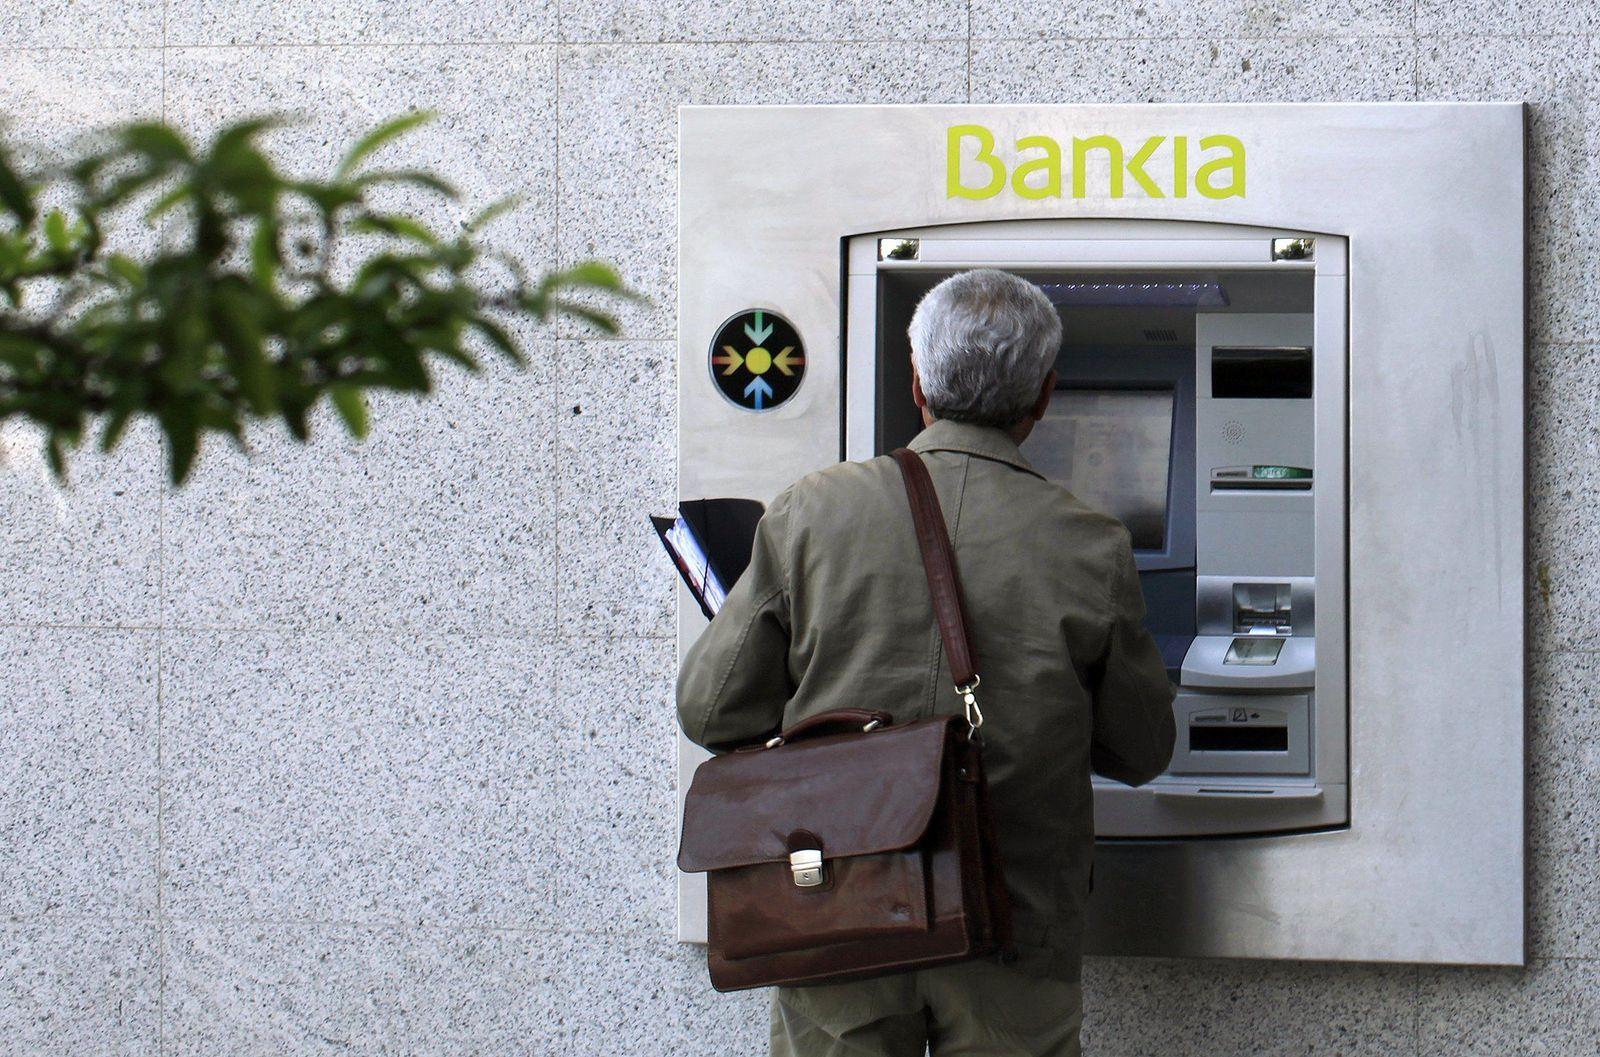 Bankia-Kunde am Geldautomaten